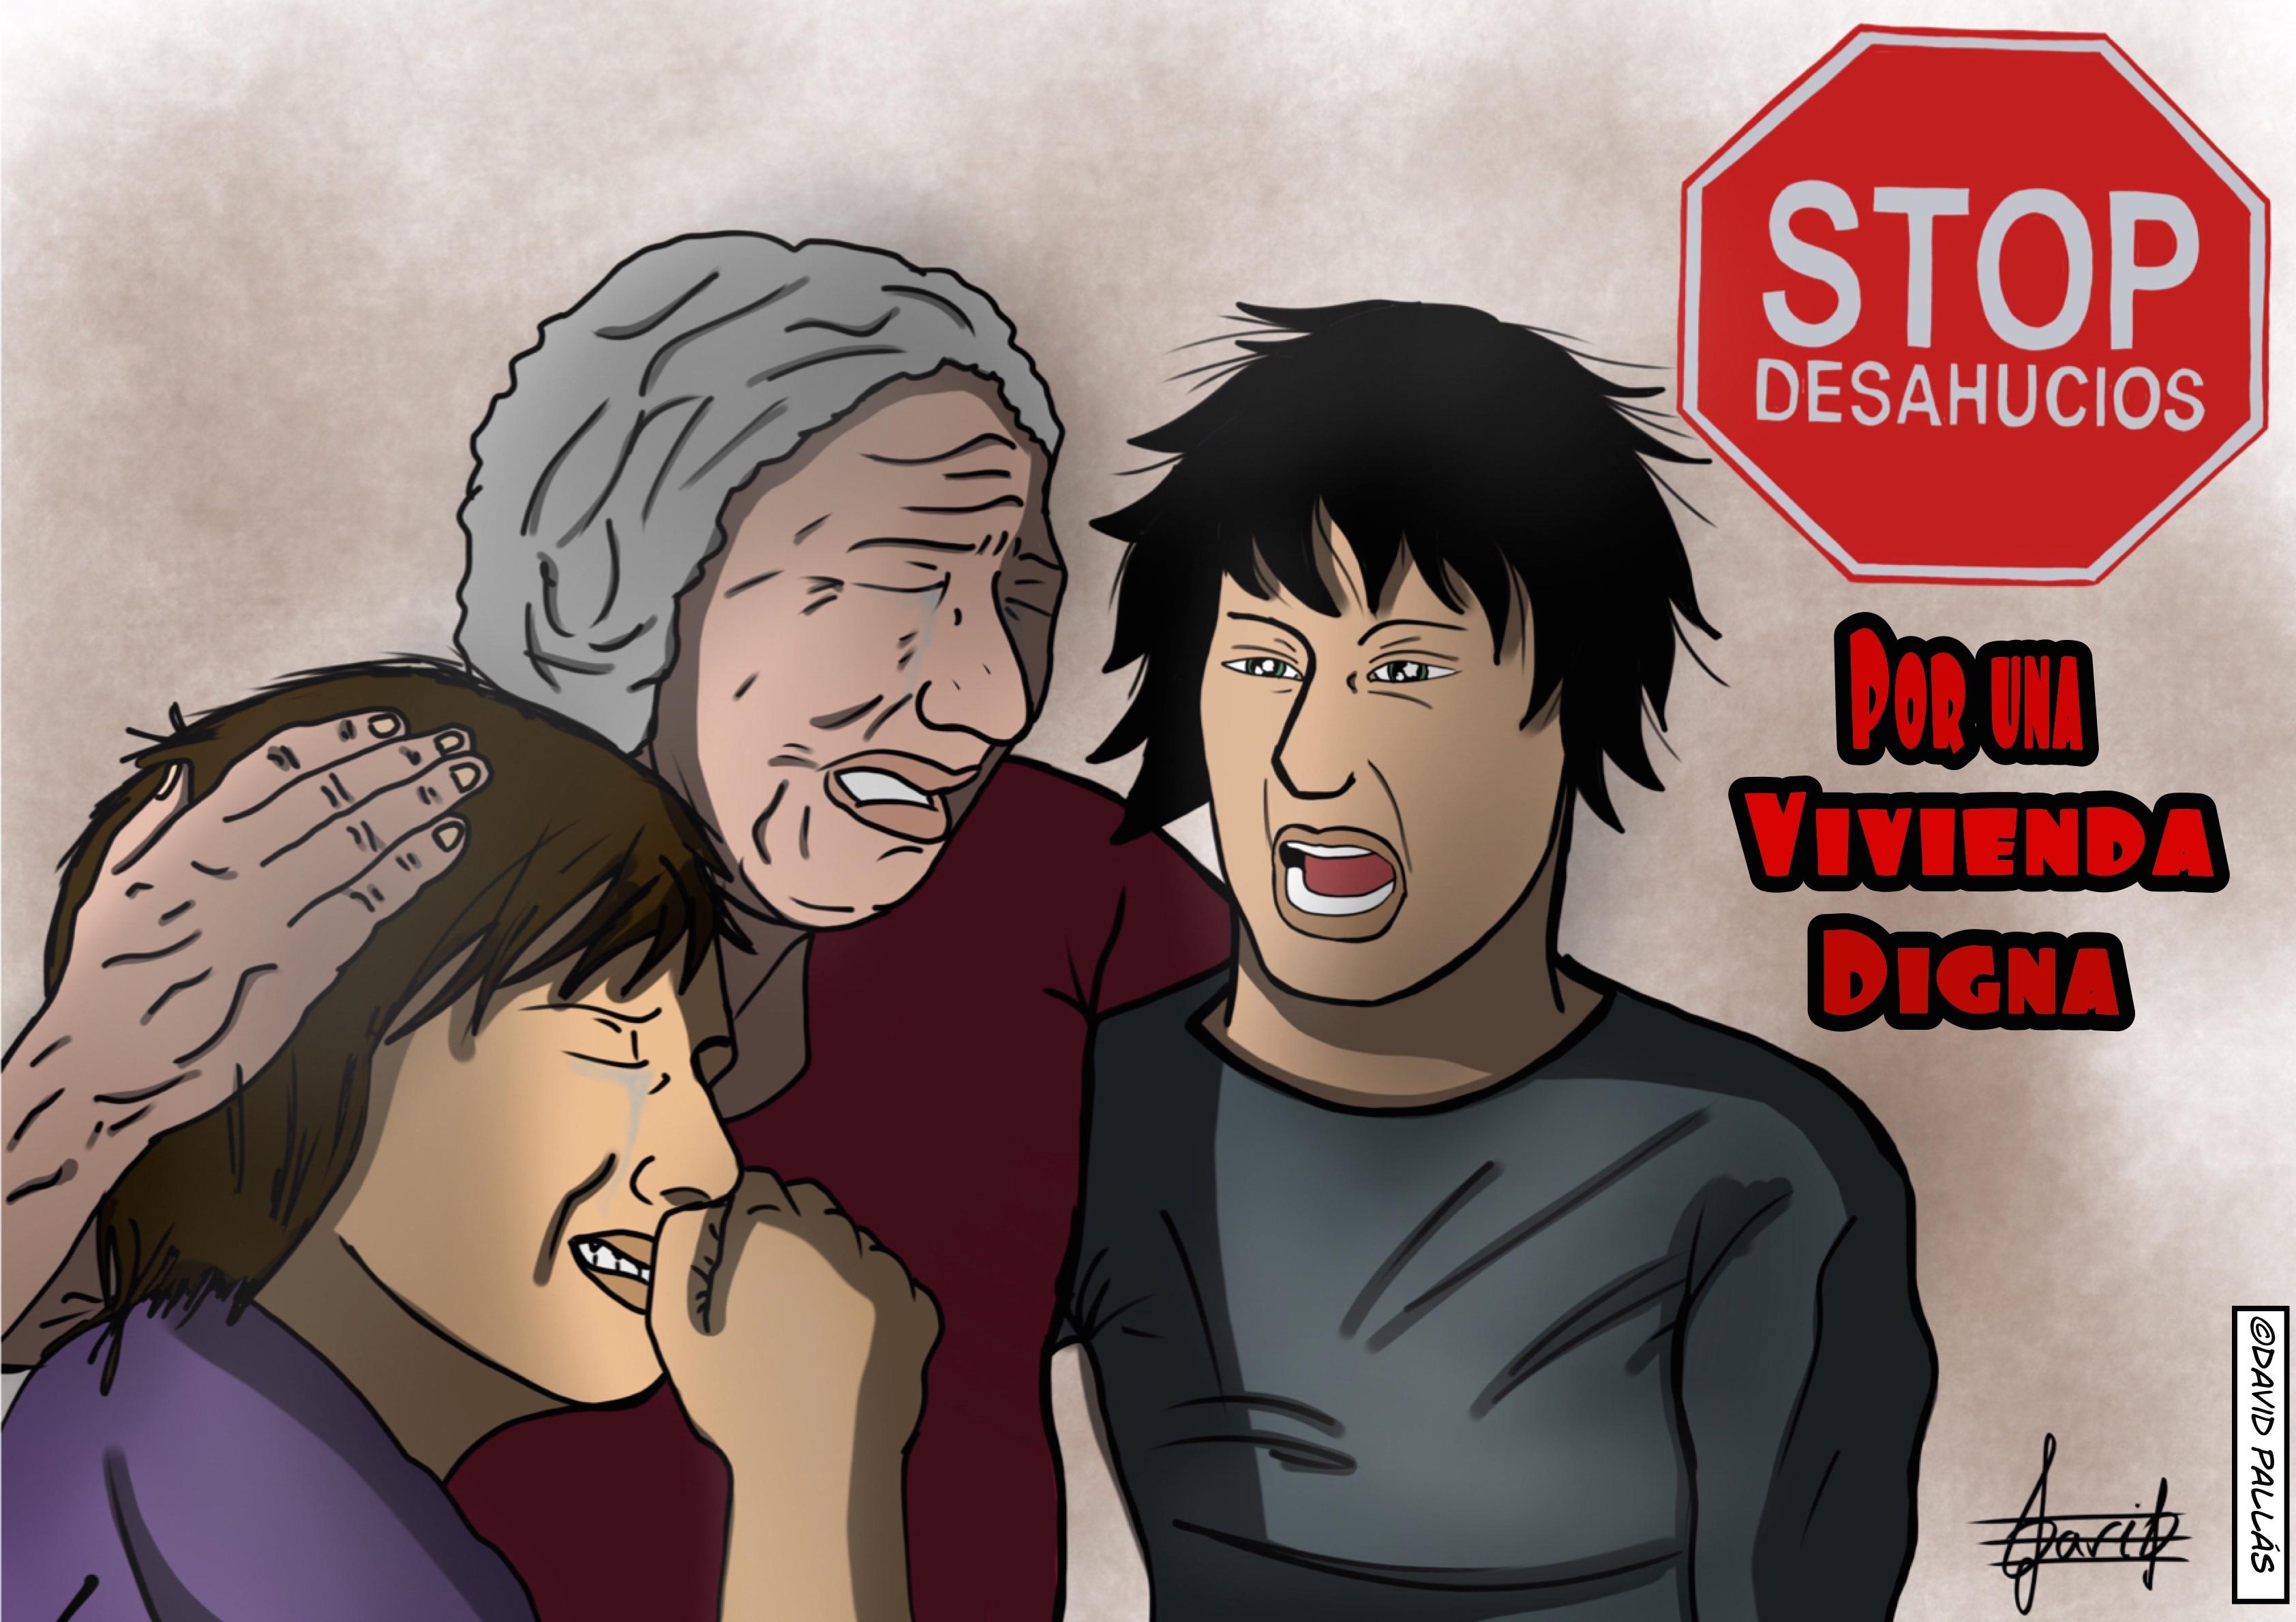 Stop_Desahucios_David_Pallás_Gozalo